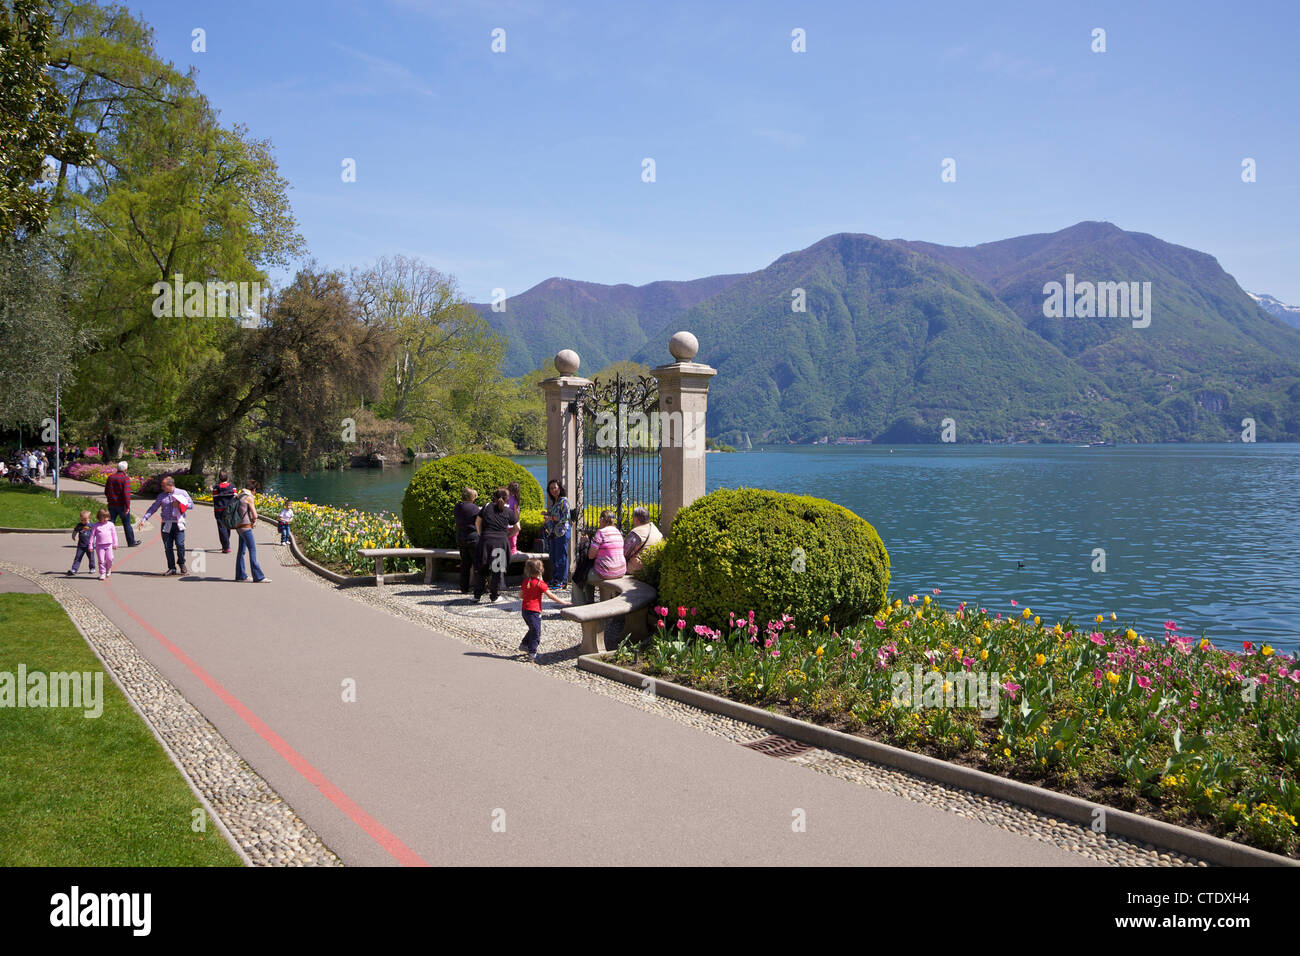 View of lake of Lugano from Parco Civico, Lugano, Lake Lugano, Ticino, Switzerland, Europe - Stock Image